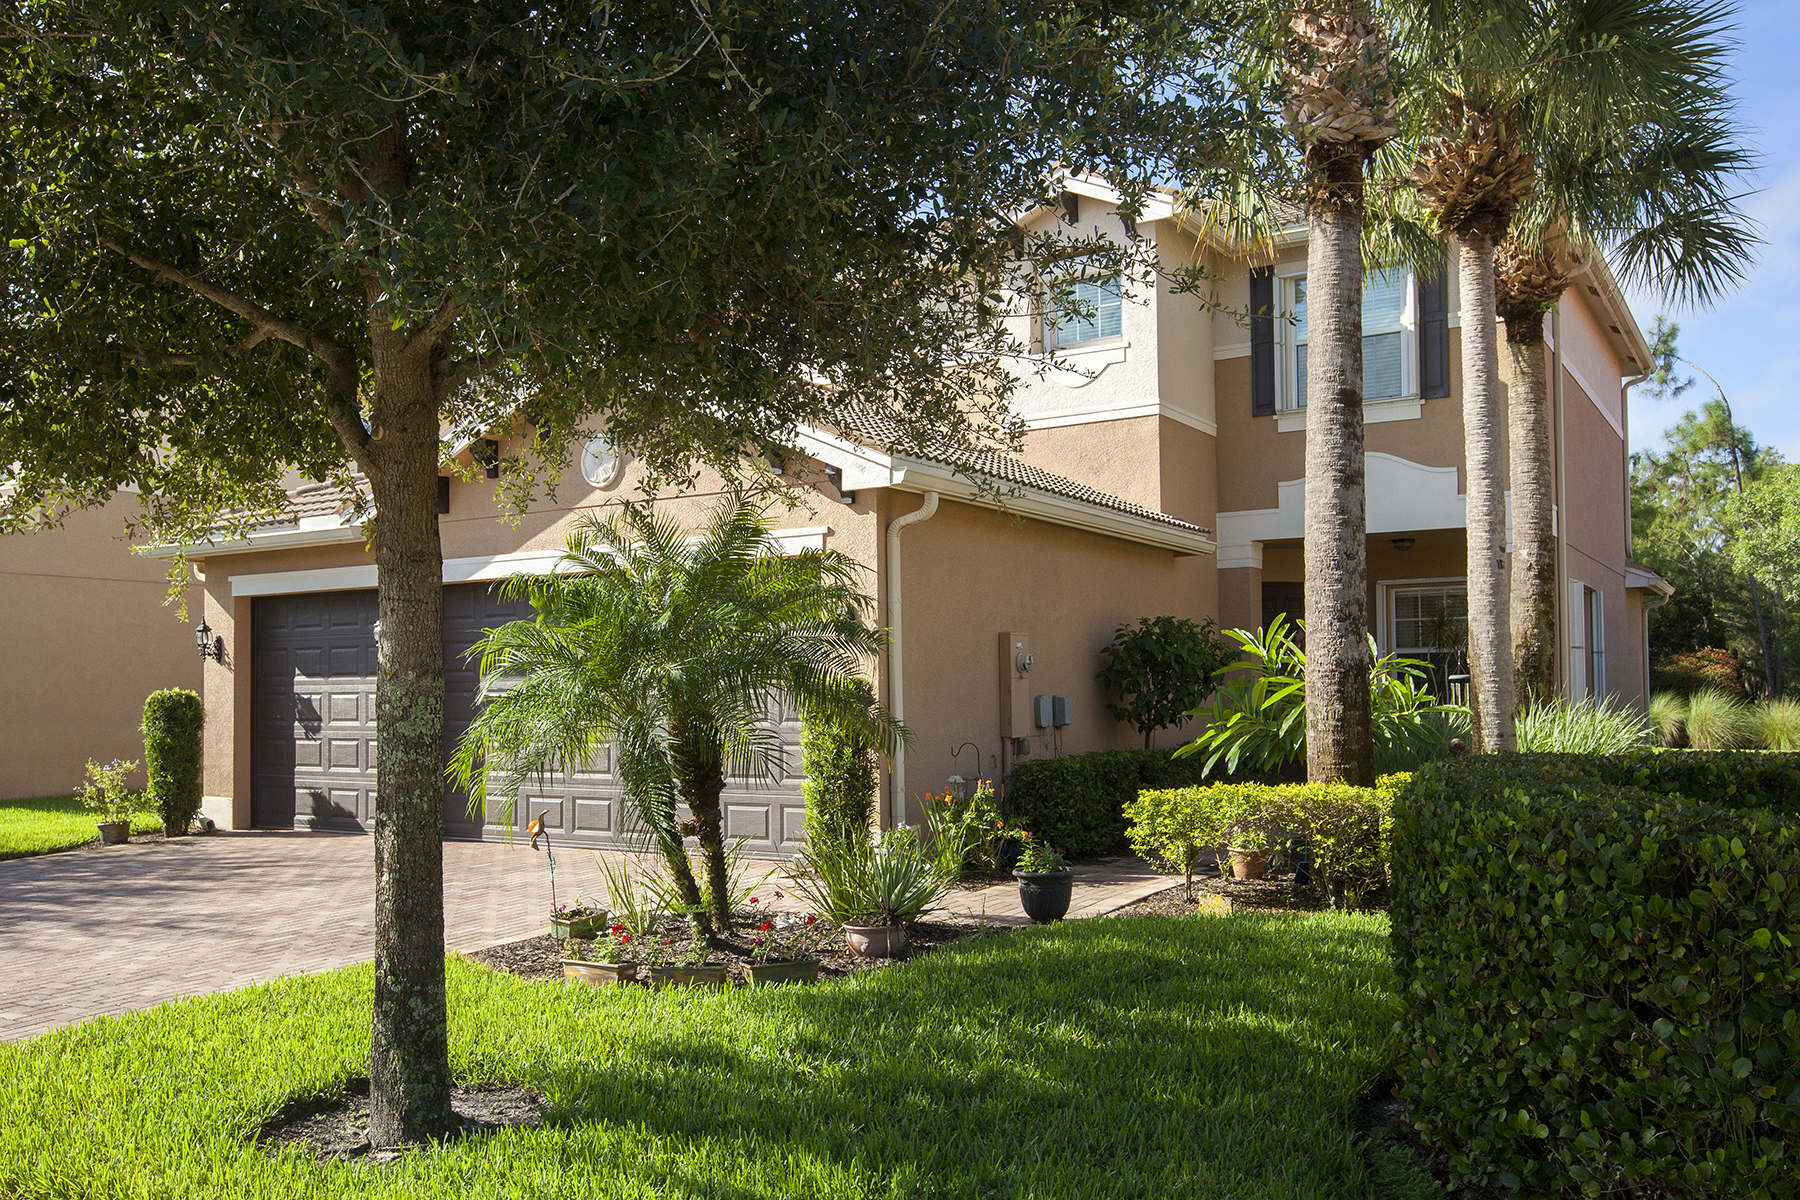 独户住宅 为 销售 在 Marbella Lakes Marbella Lakes 6820 Del Mar 那不勒斯, 佛罗里达州, 34105 美国